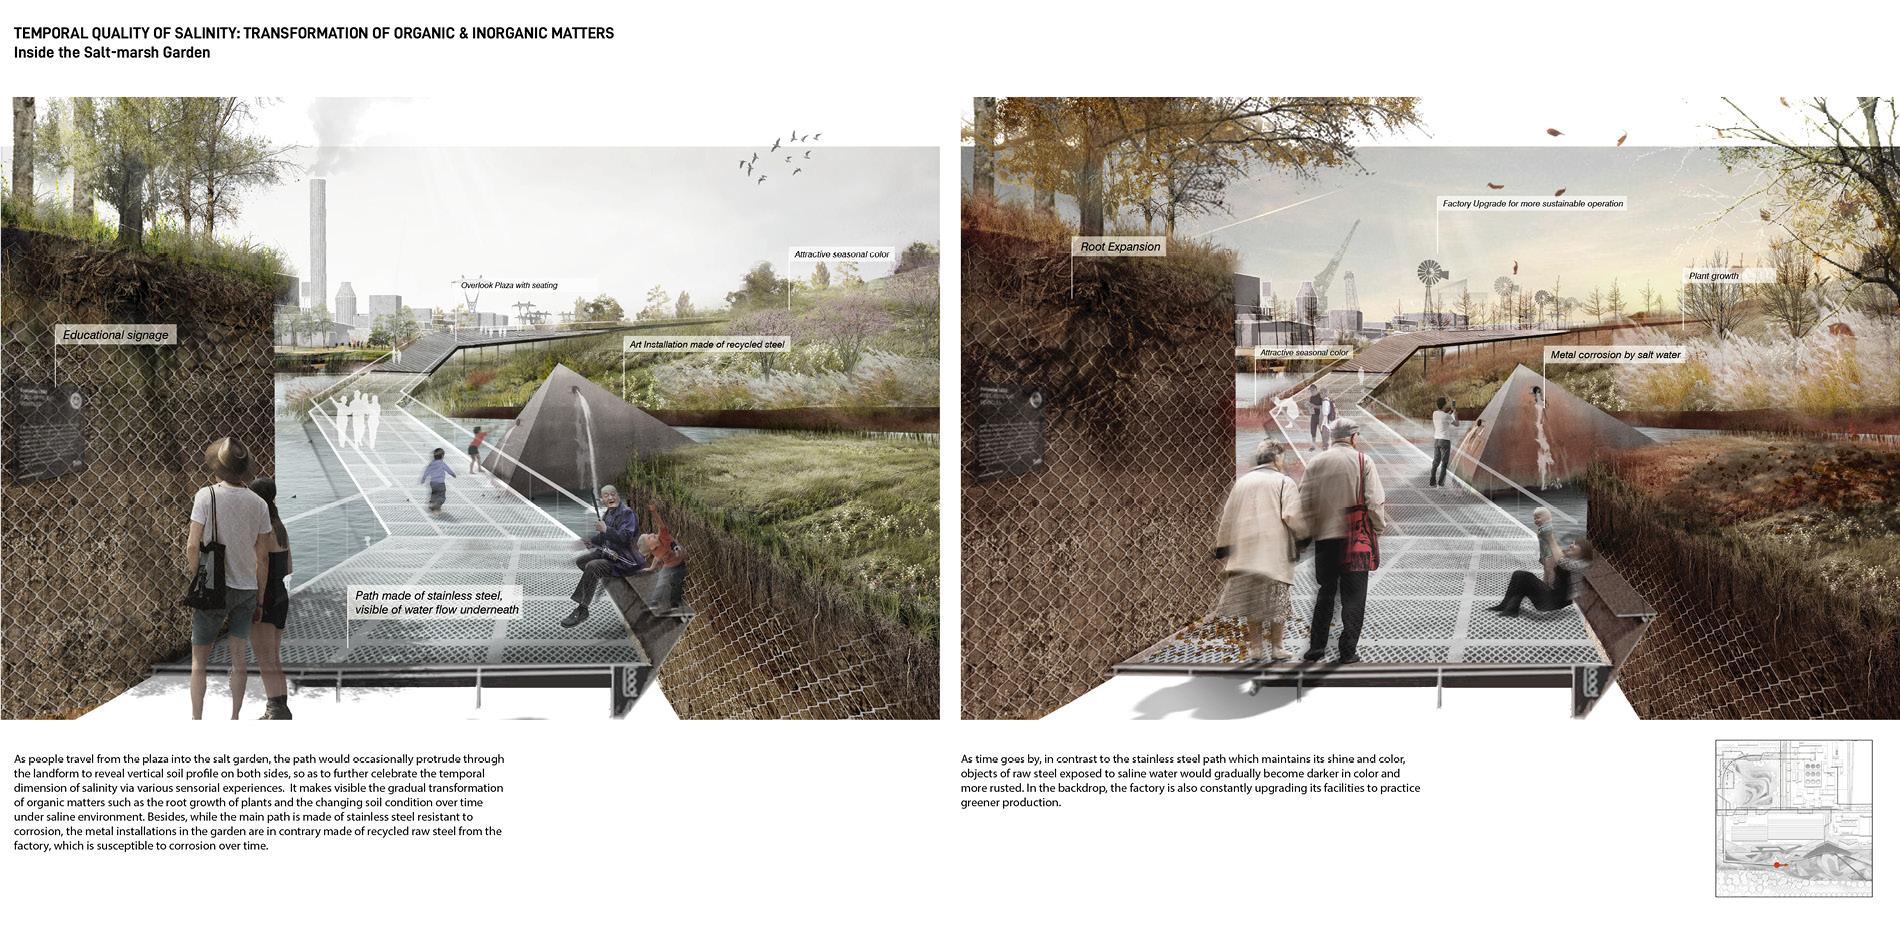 Rockcheck Vision: Salt-marsh Garden